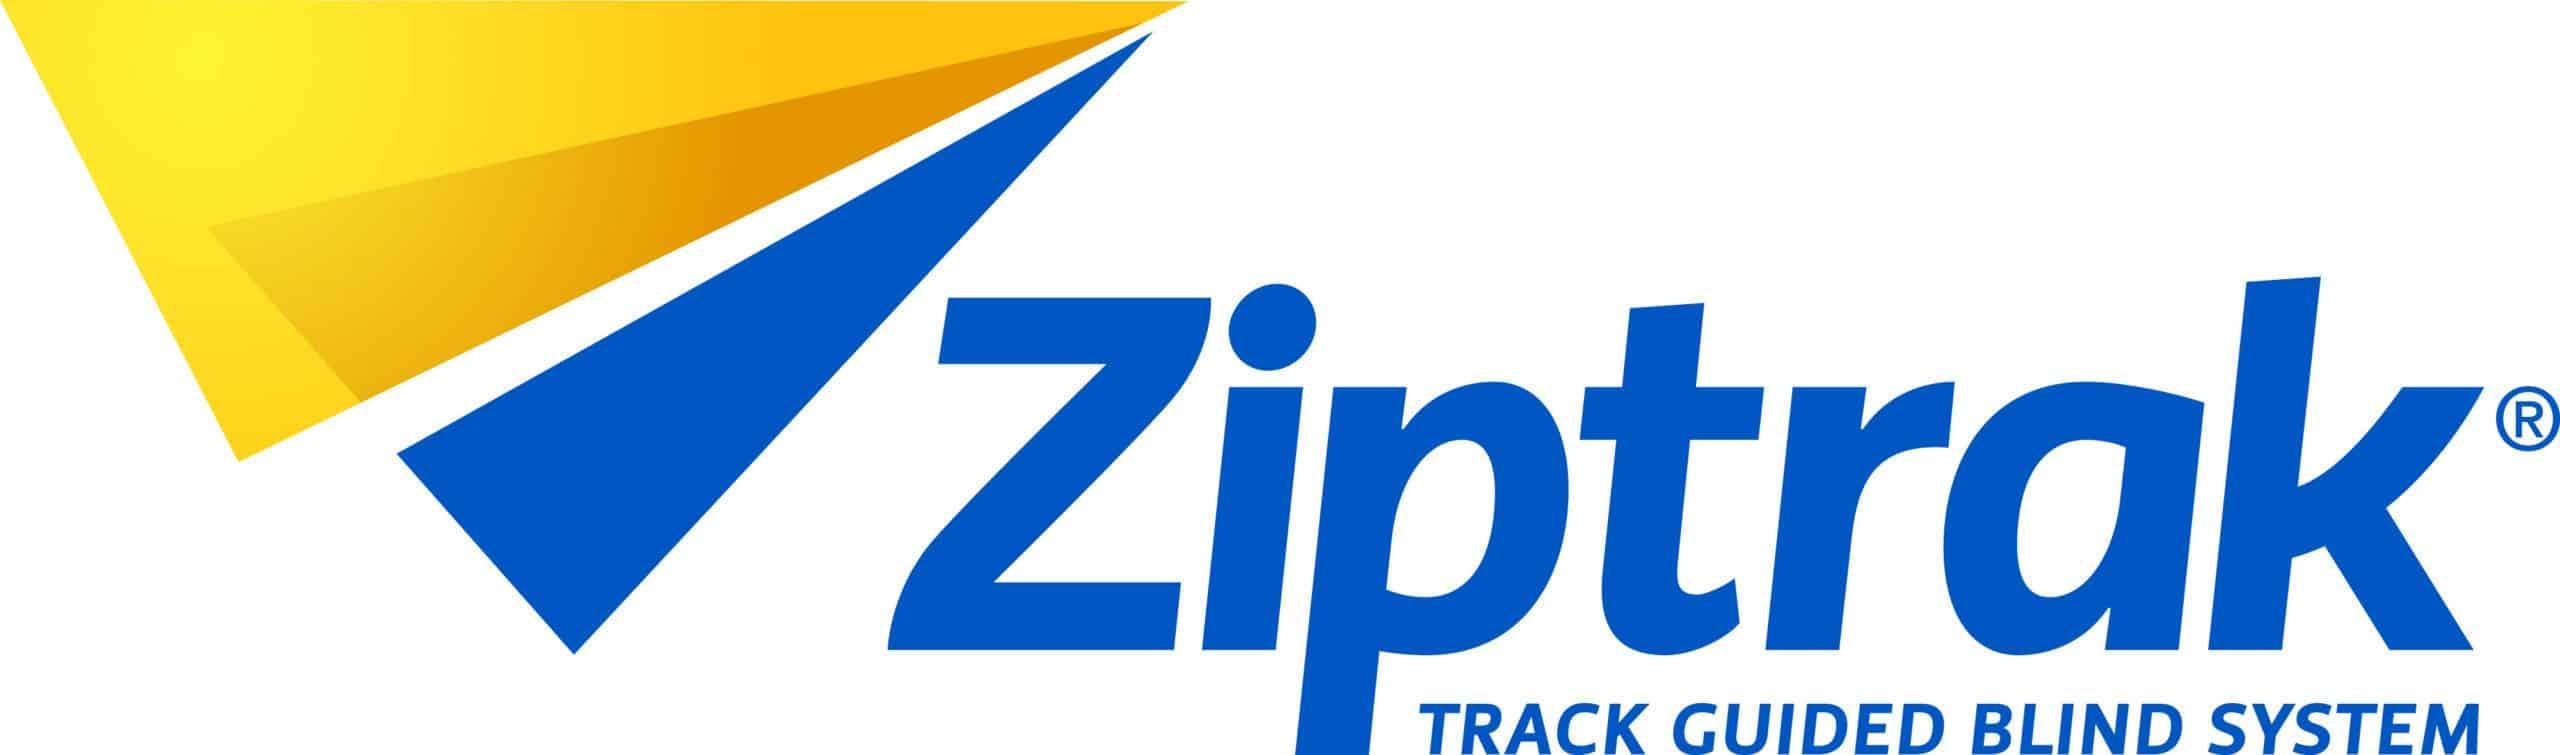 Ziptrak® Logo Blue High Resolution CMYK JPEG scaled